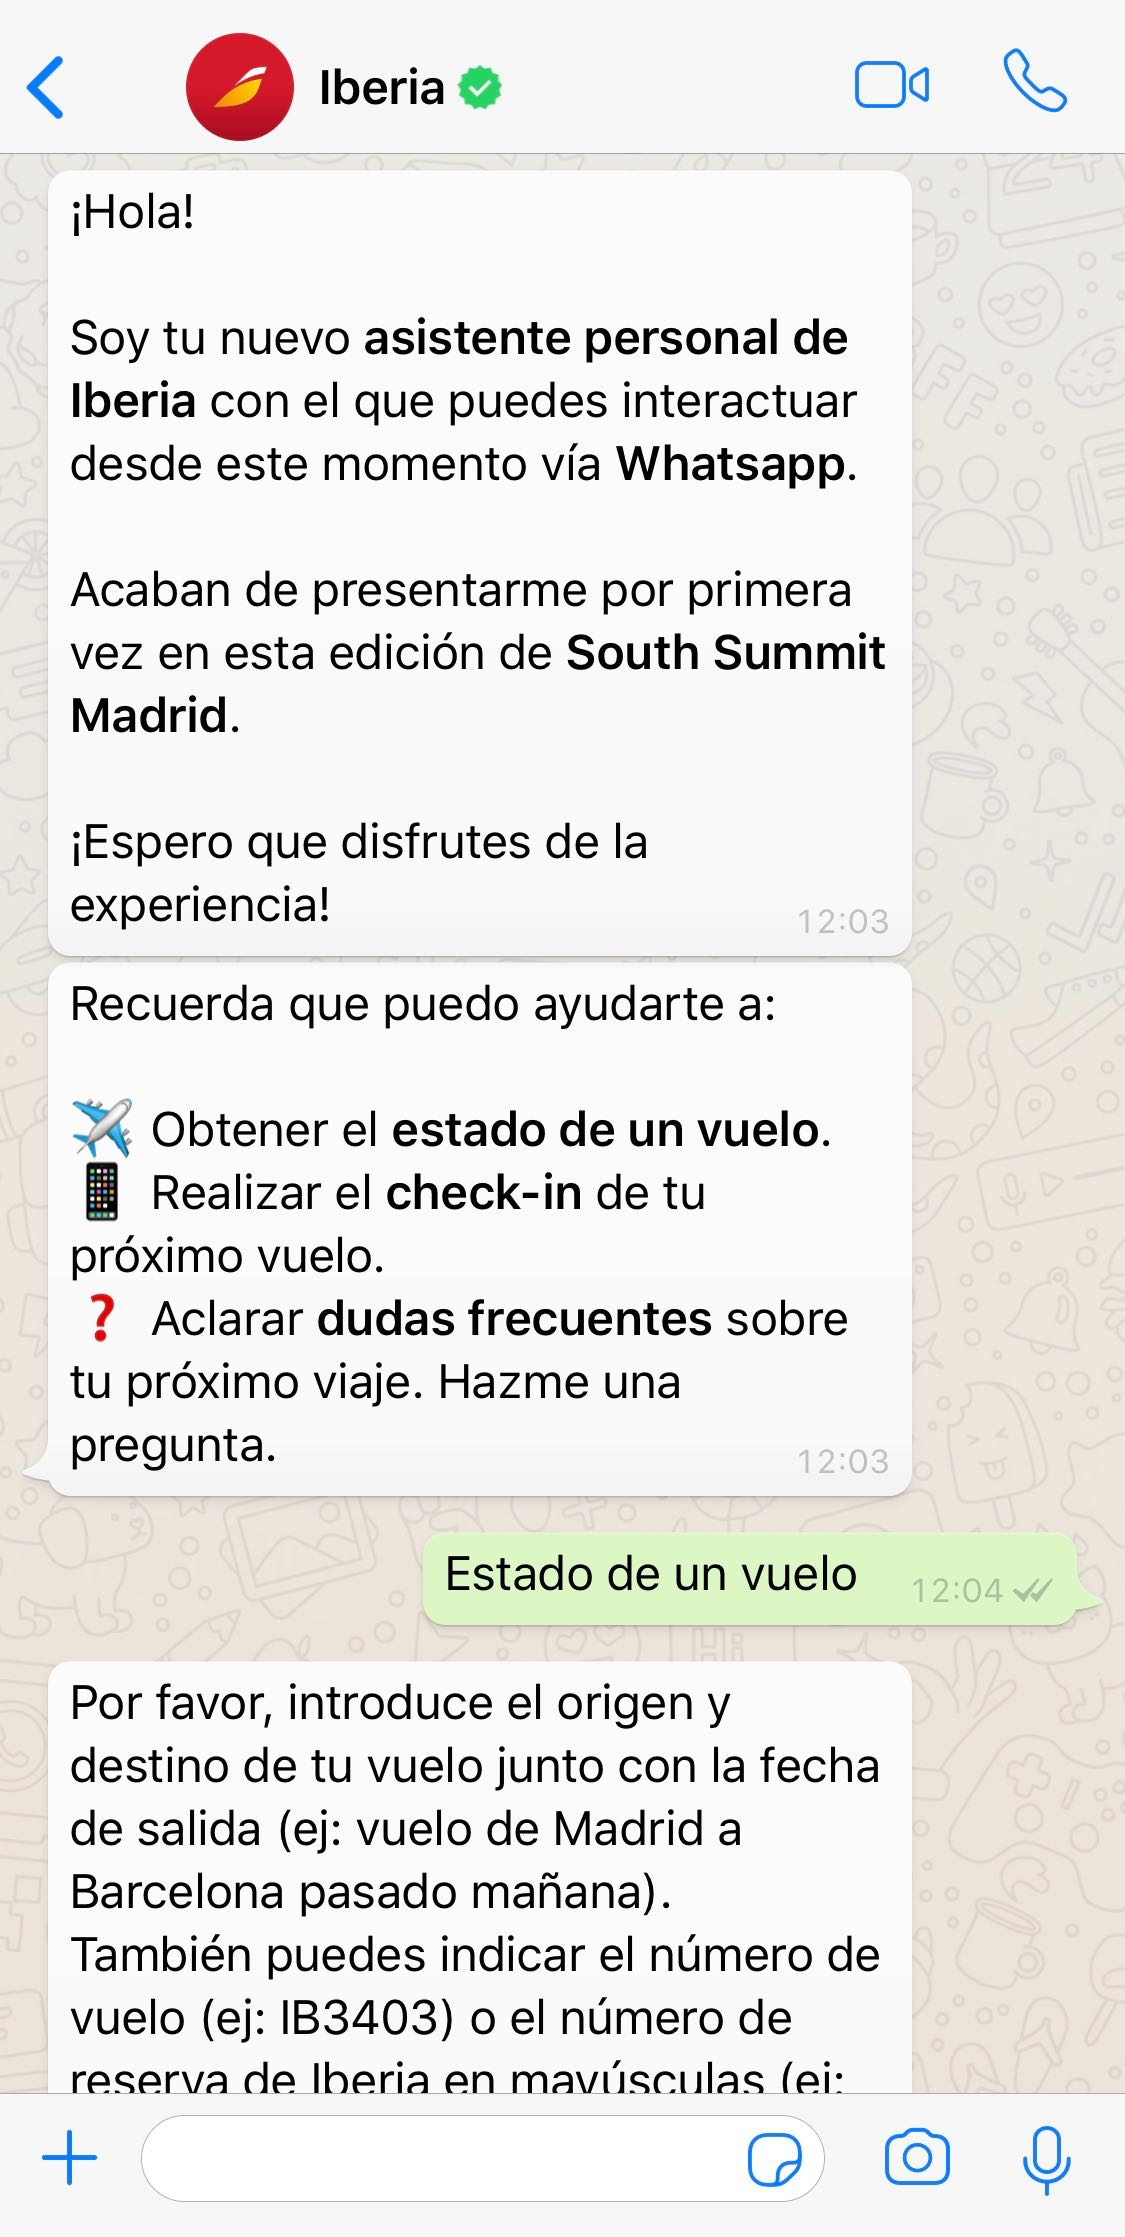 Iberia WhatsApp Chatbot